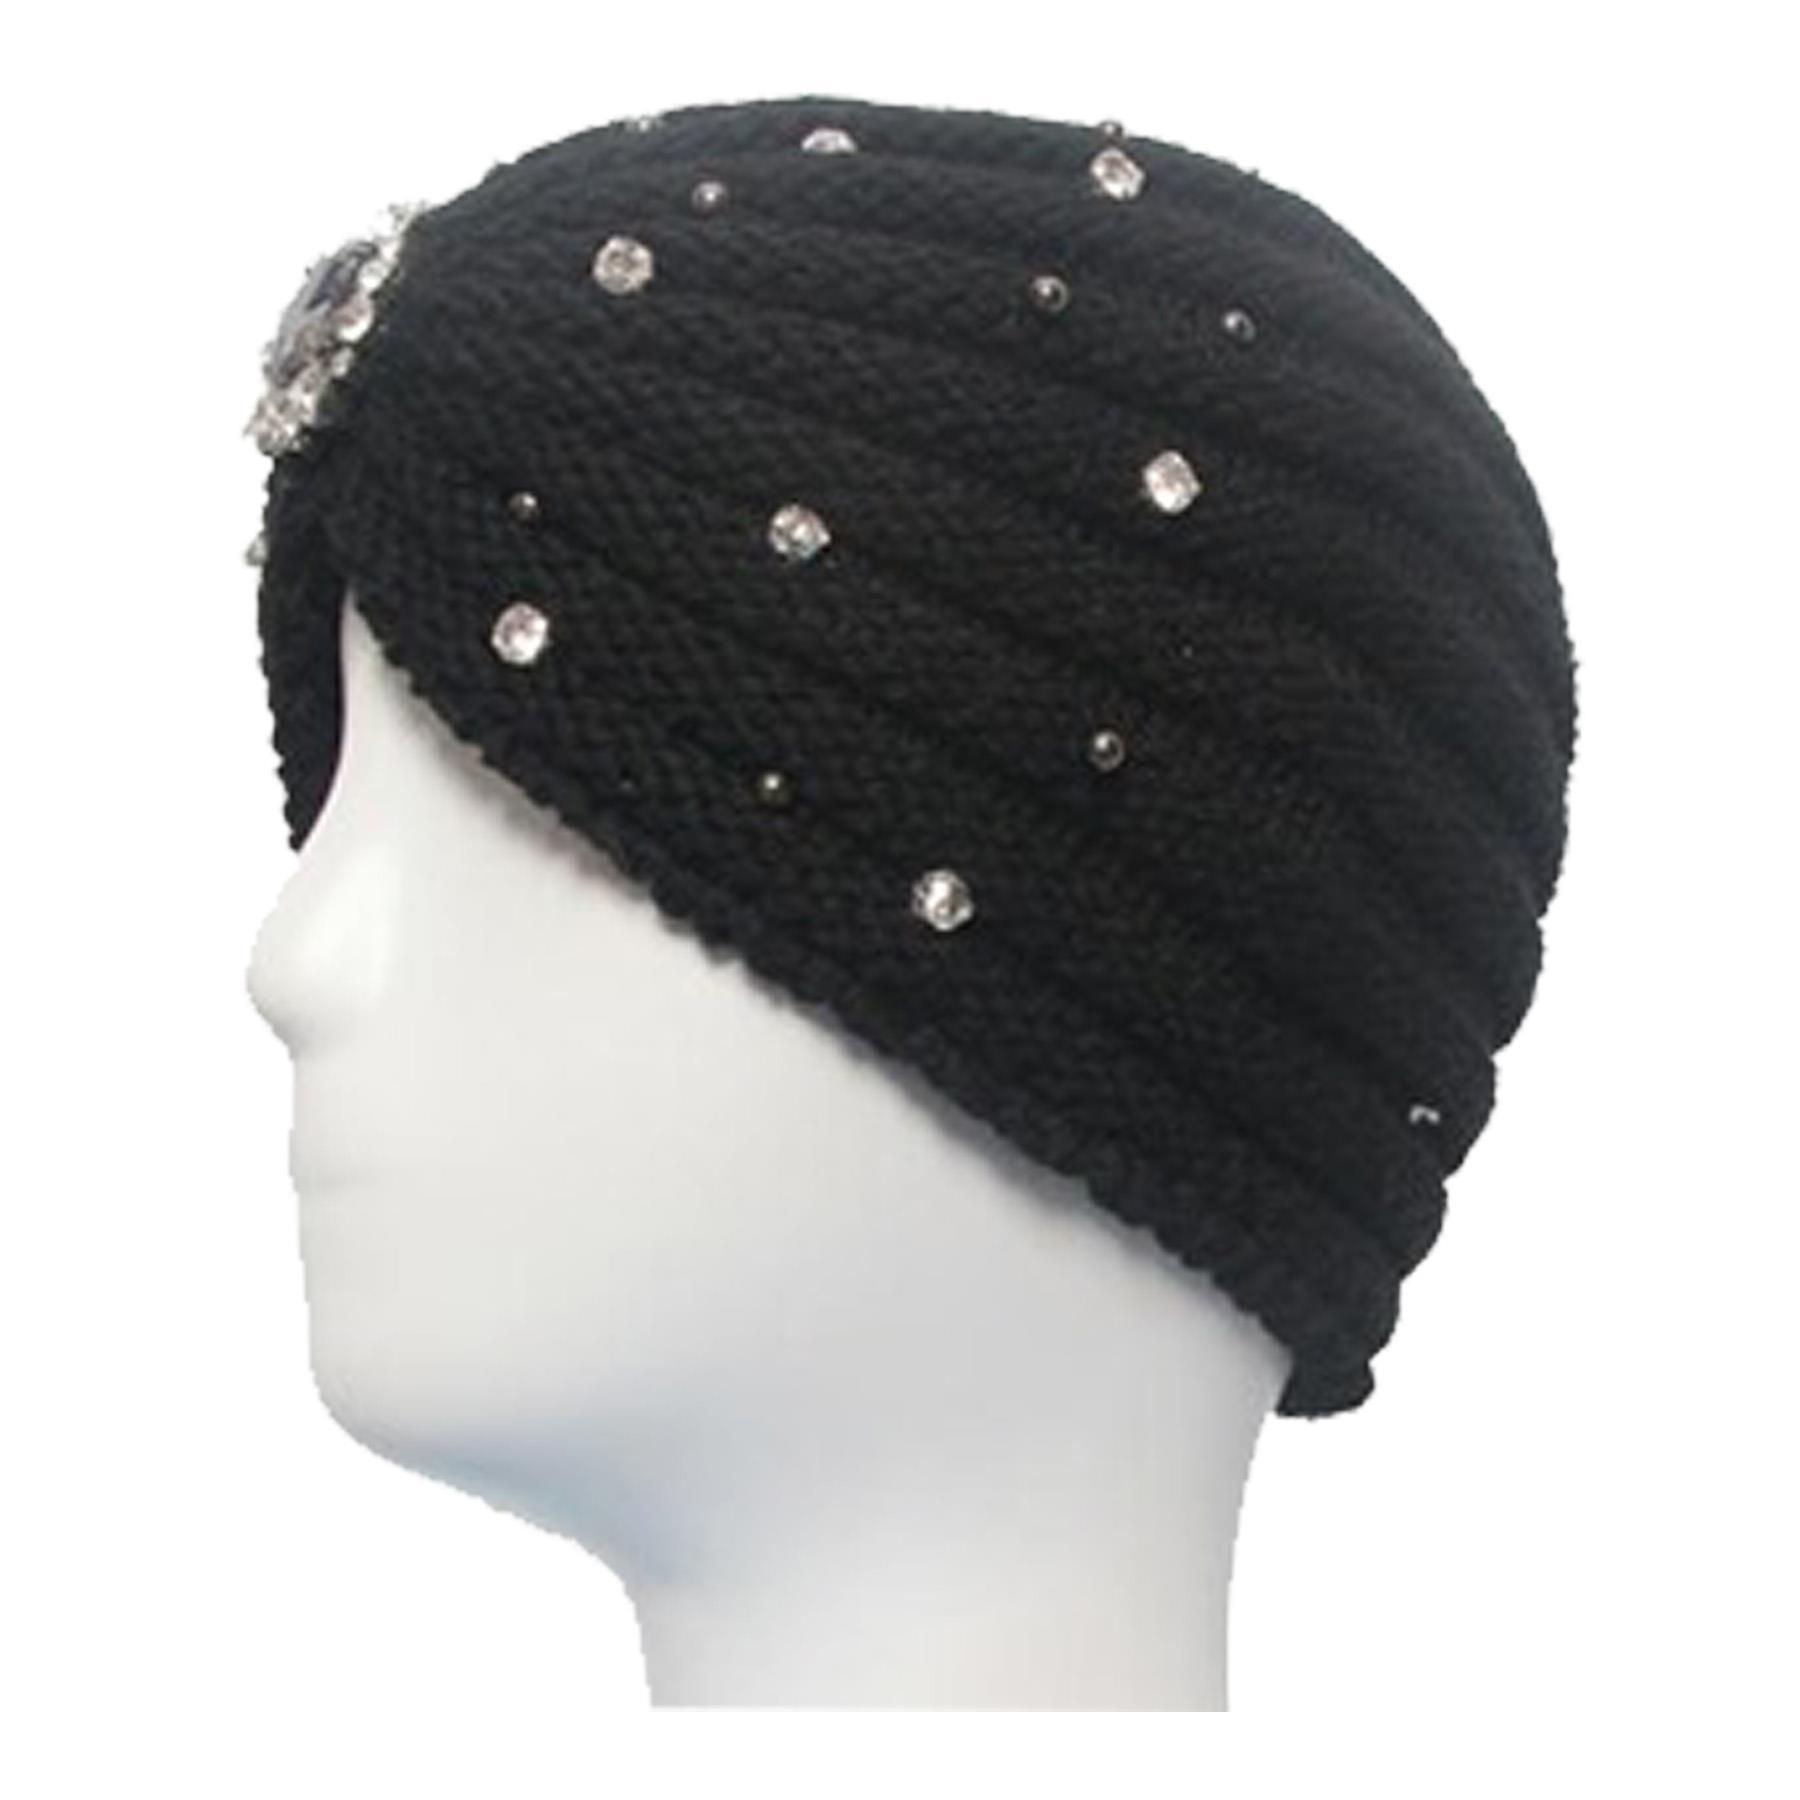 New-Women-s-Pleated-Knitted-Acrylic-Jewel-Detail-Headwear-Turban-Cap thumbnail 15